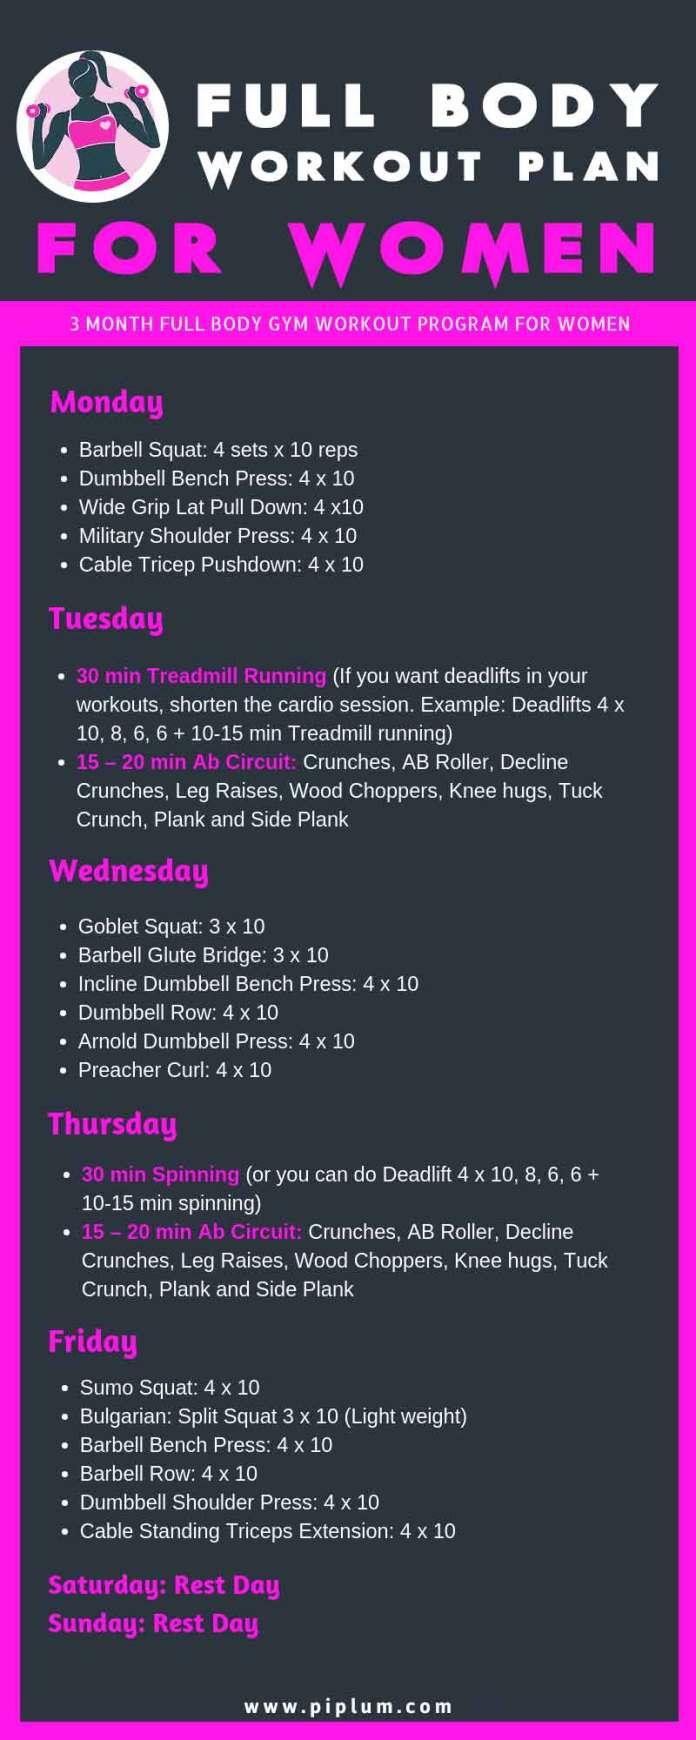 women-full-body-workout-poster-gym-program